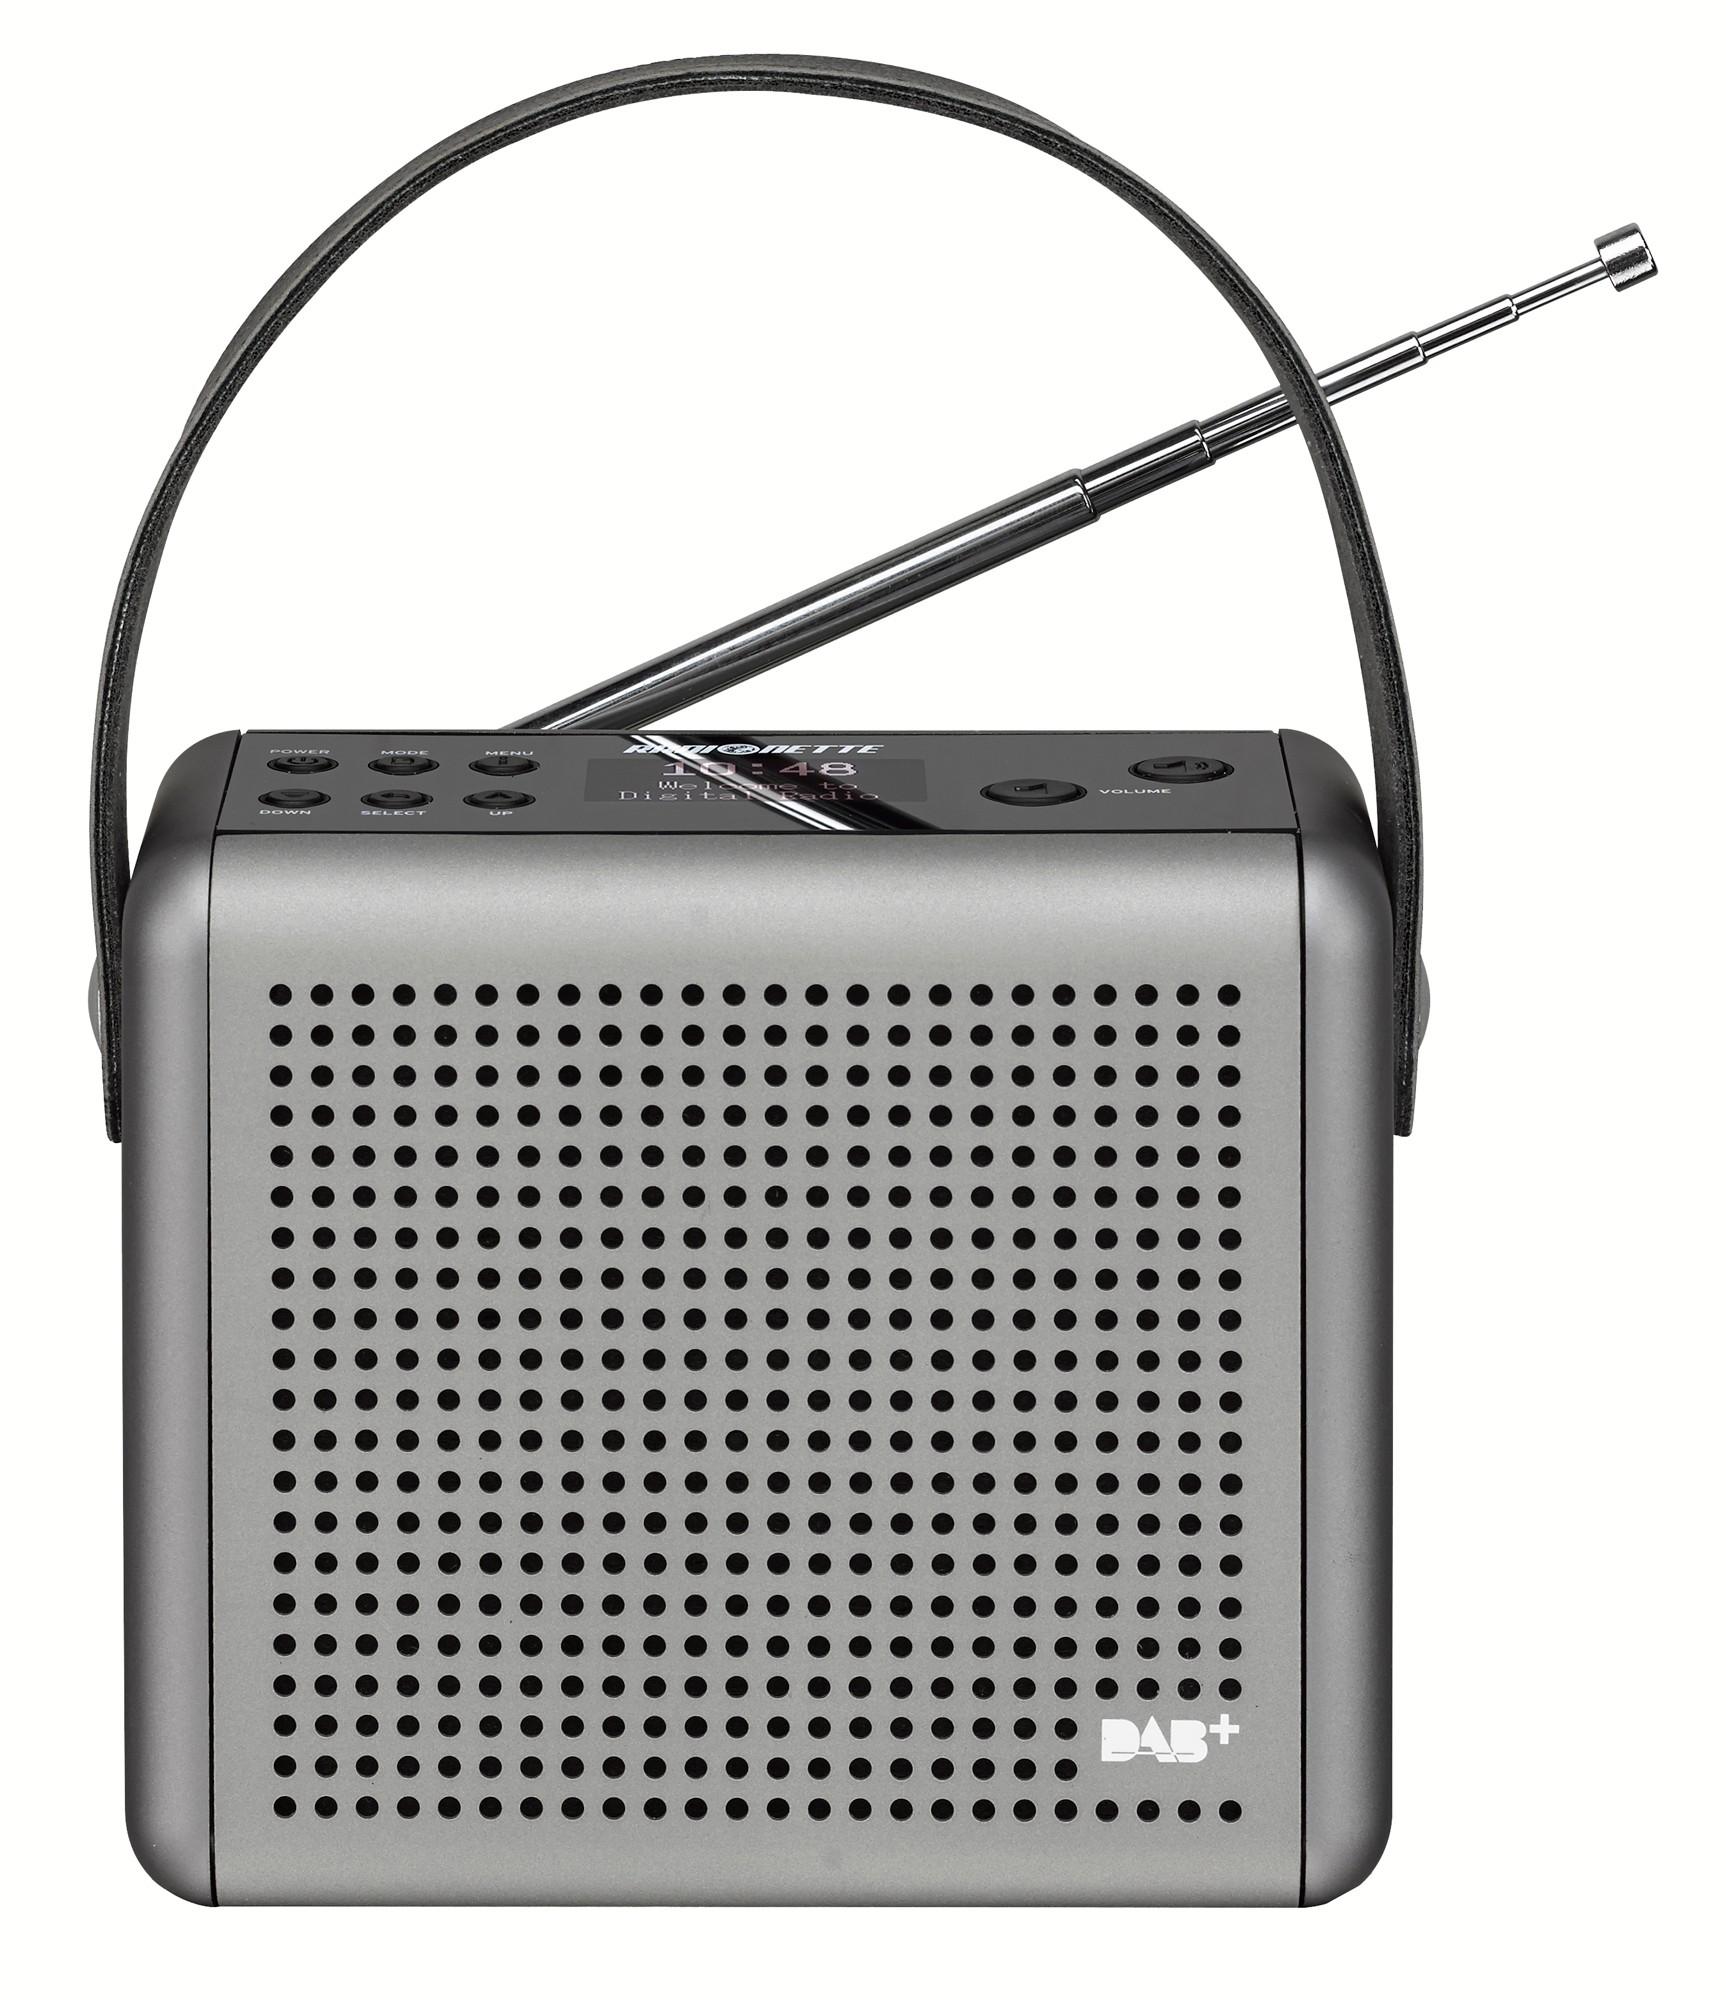 83506 : Radionette DAB+/FM radio RNPDMS14E (sølv)